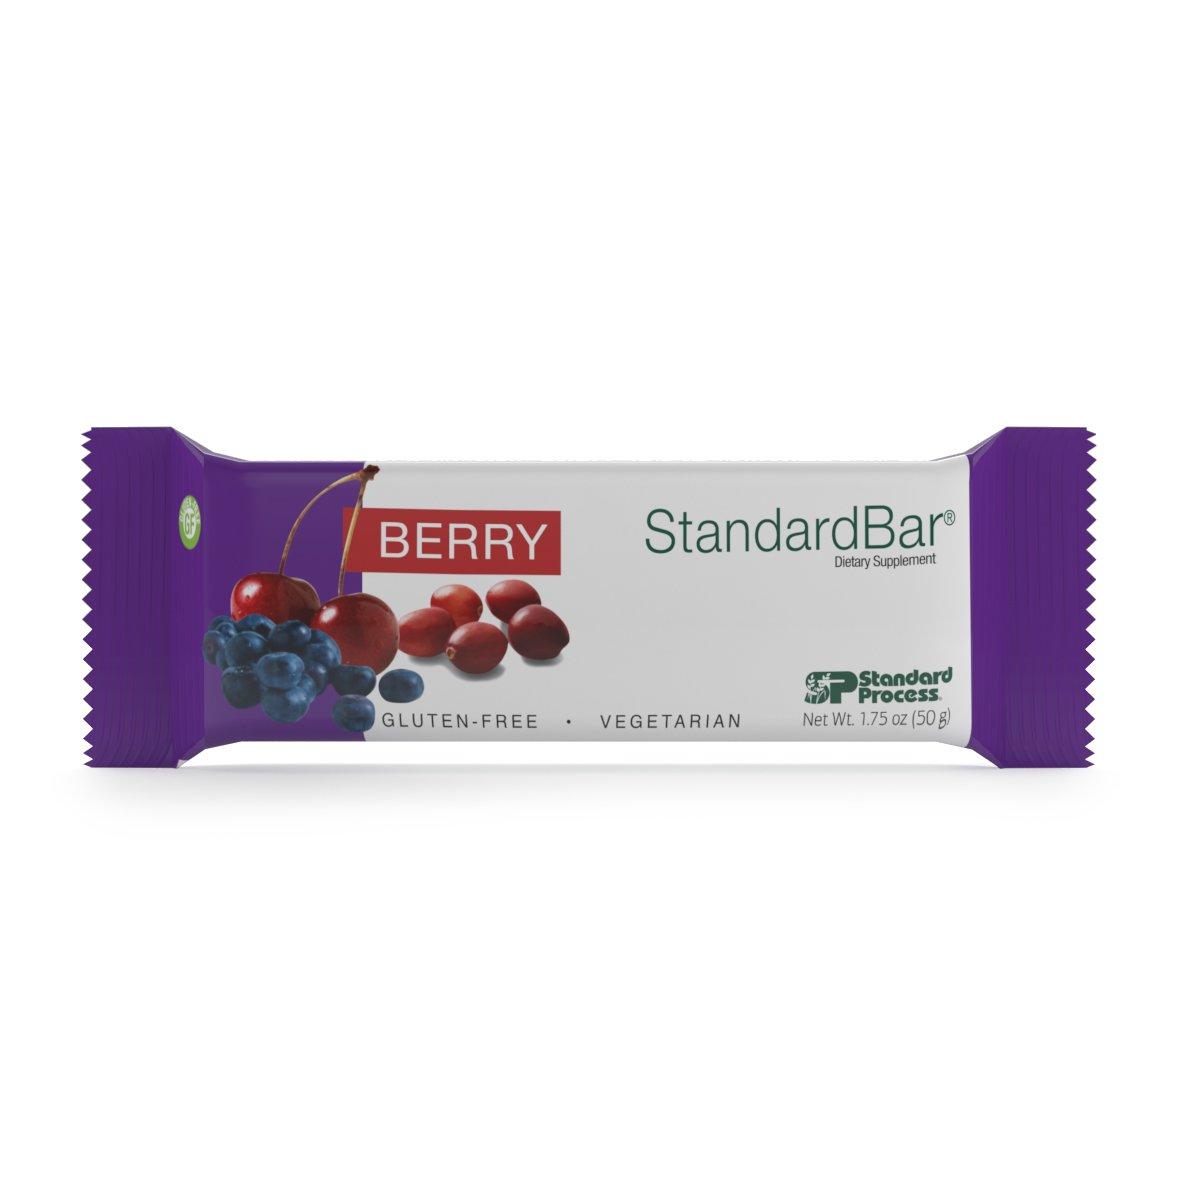 Standard Process - Berry StandardBar - Nutritious Blend of 3 Natural Fruits, 10g Protein with Calcium, Dietary Fiber, Gluten Free and Vegetarian - 18 Bars (1.75 oz. Each)